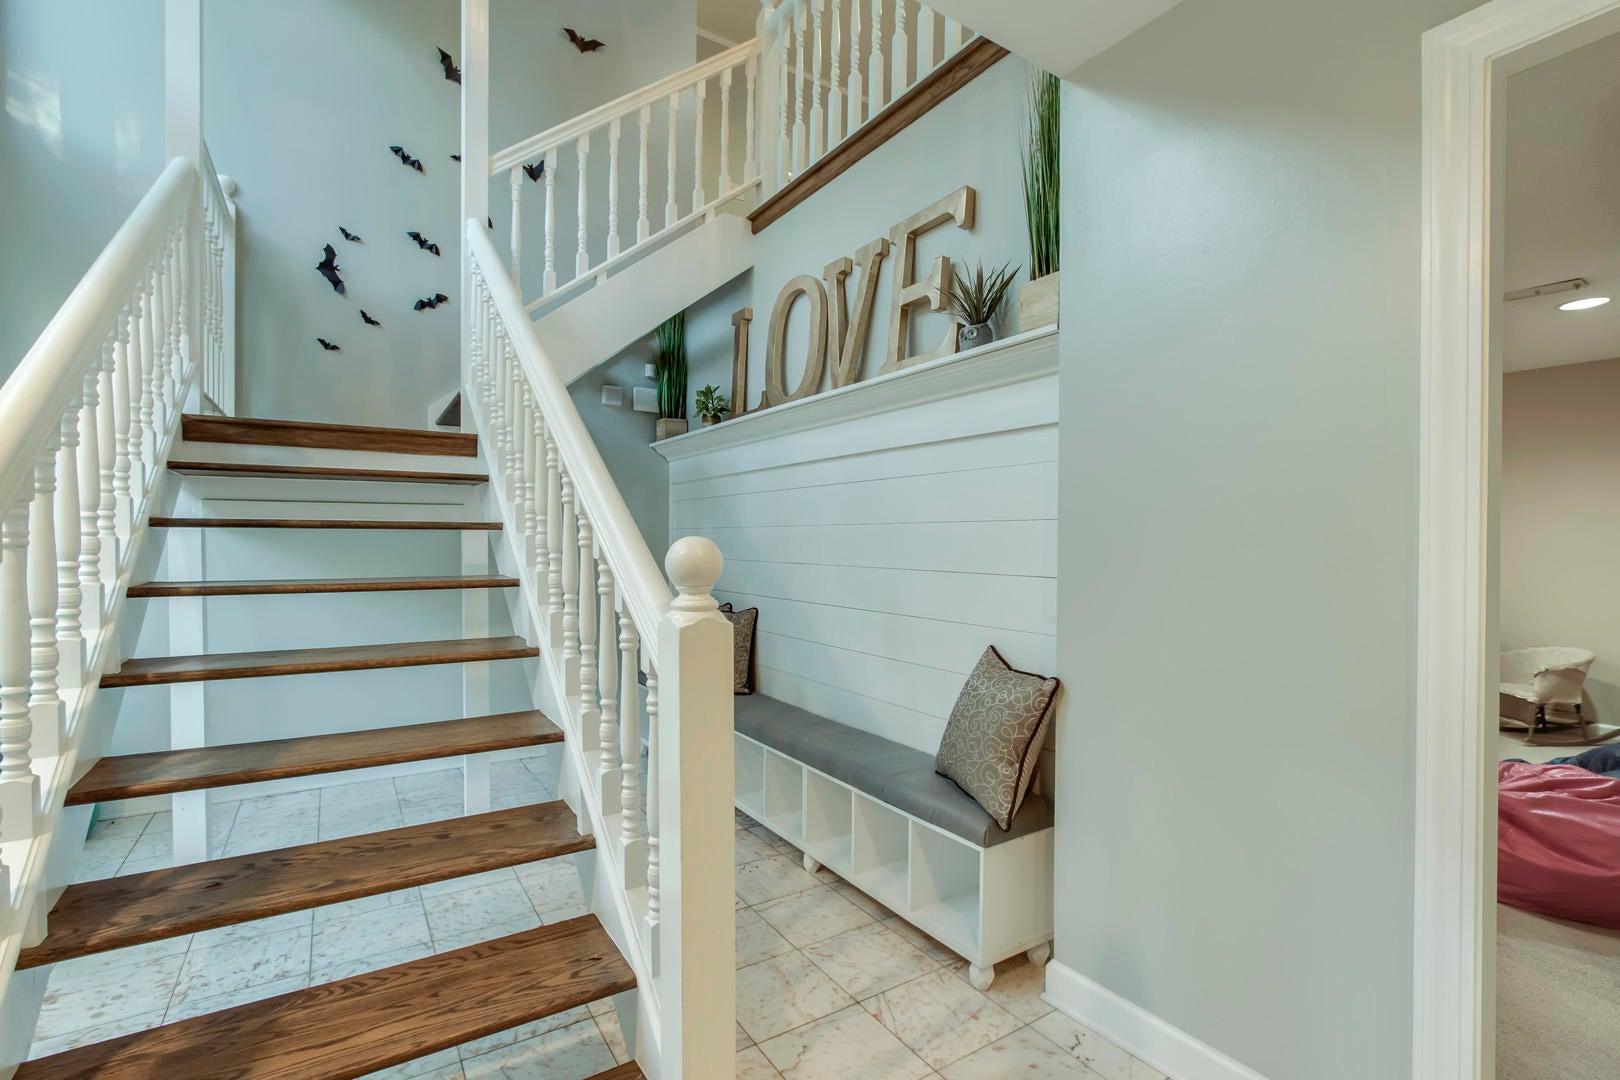 30_OakhurstDriveSW_431_L1-StairsUp02